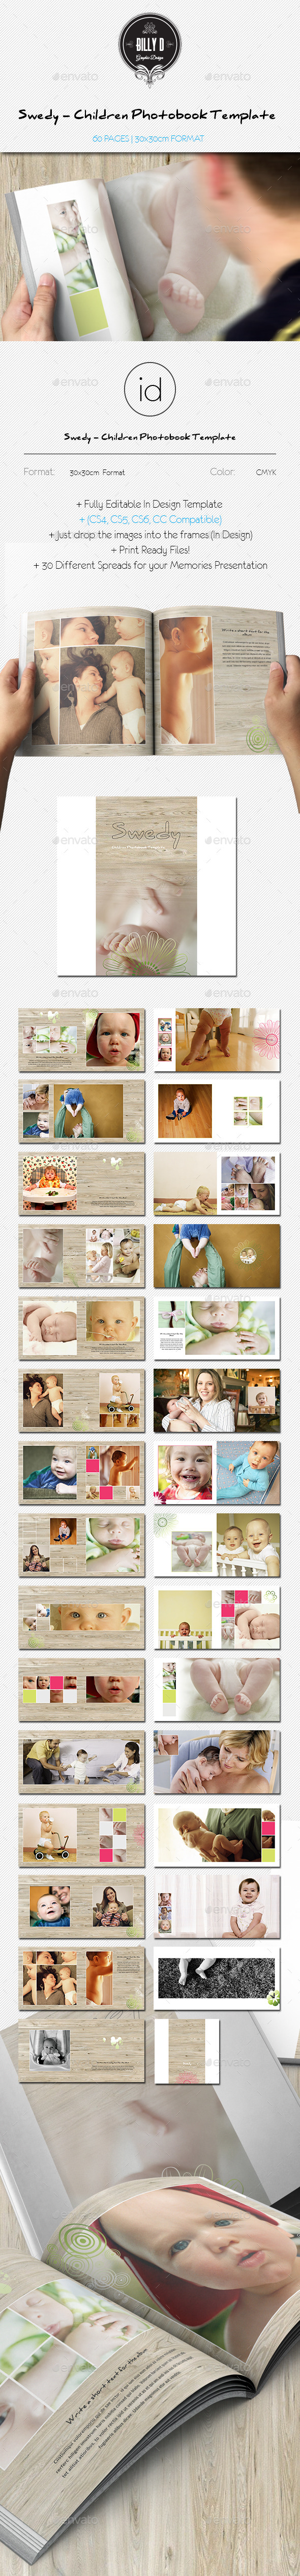 GraphicRiver Swedy Children Photobook Template 9407063